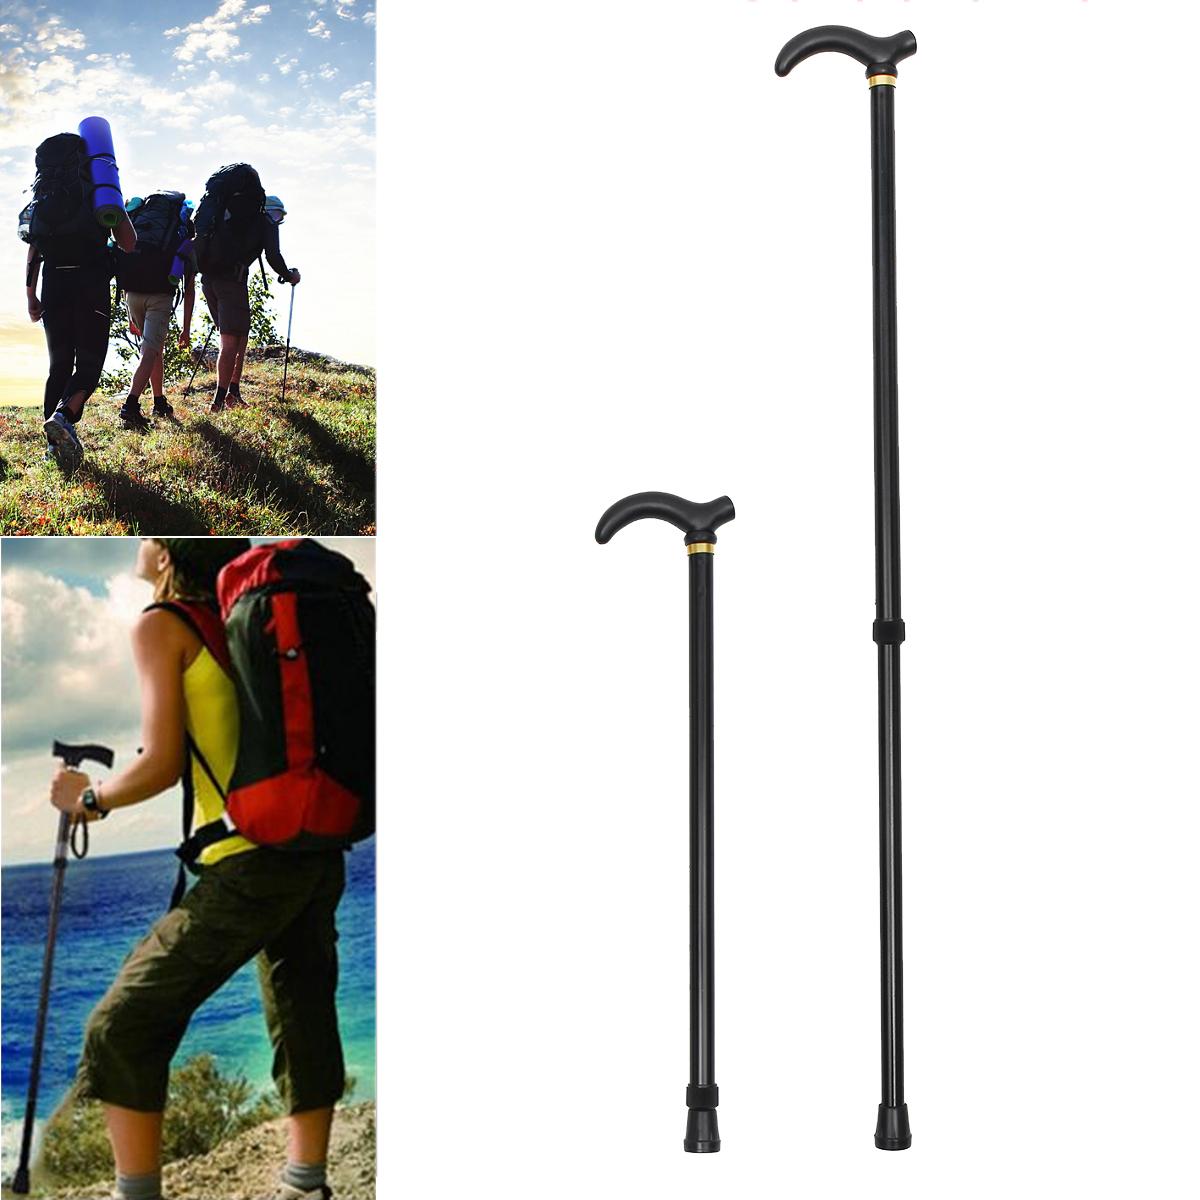 75-90CM Metal Adjustable Walking Hiking Stick Travel Folding Cane Pole Compact Alpenstock